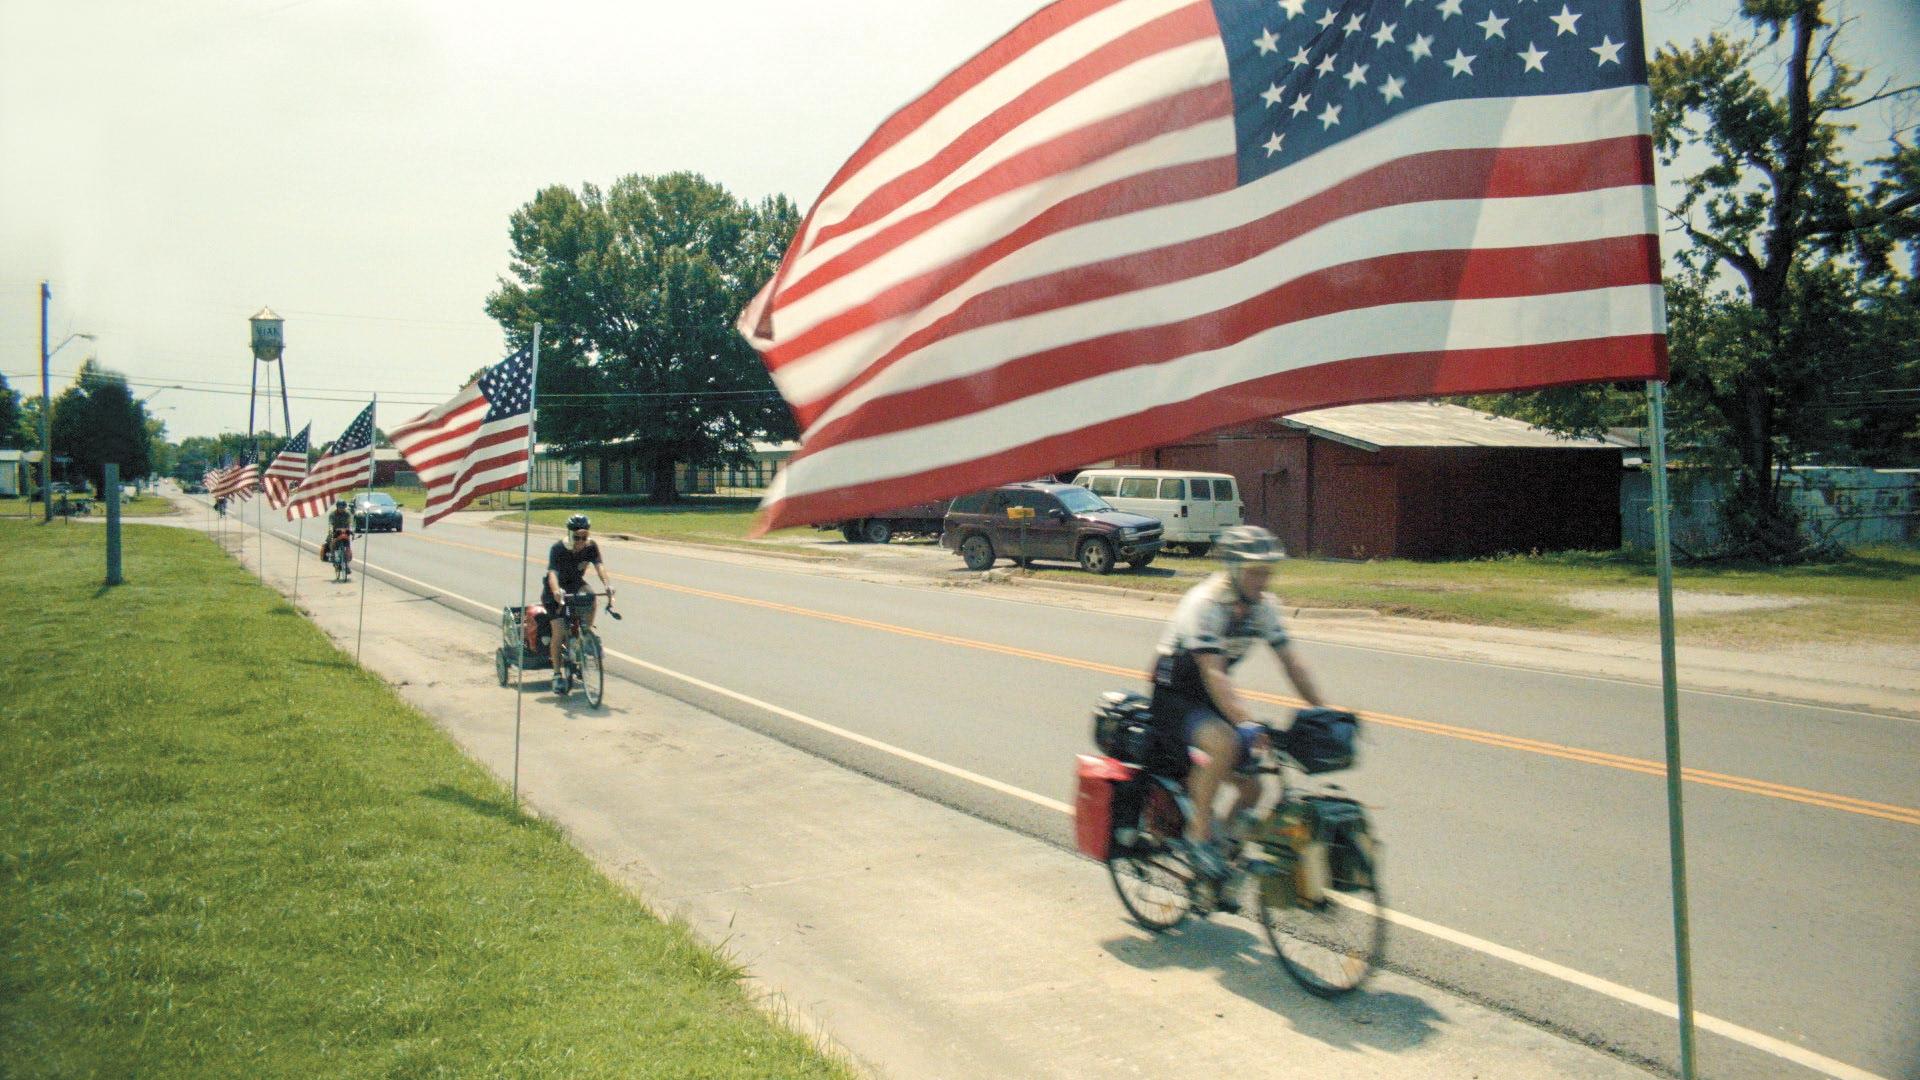 Image extraite du film The Bikes of Wrath